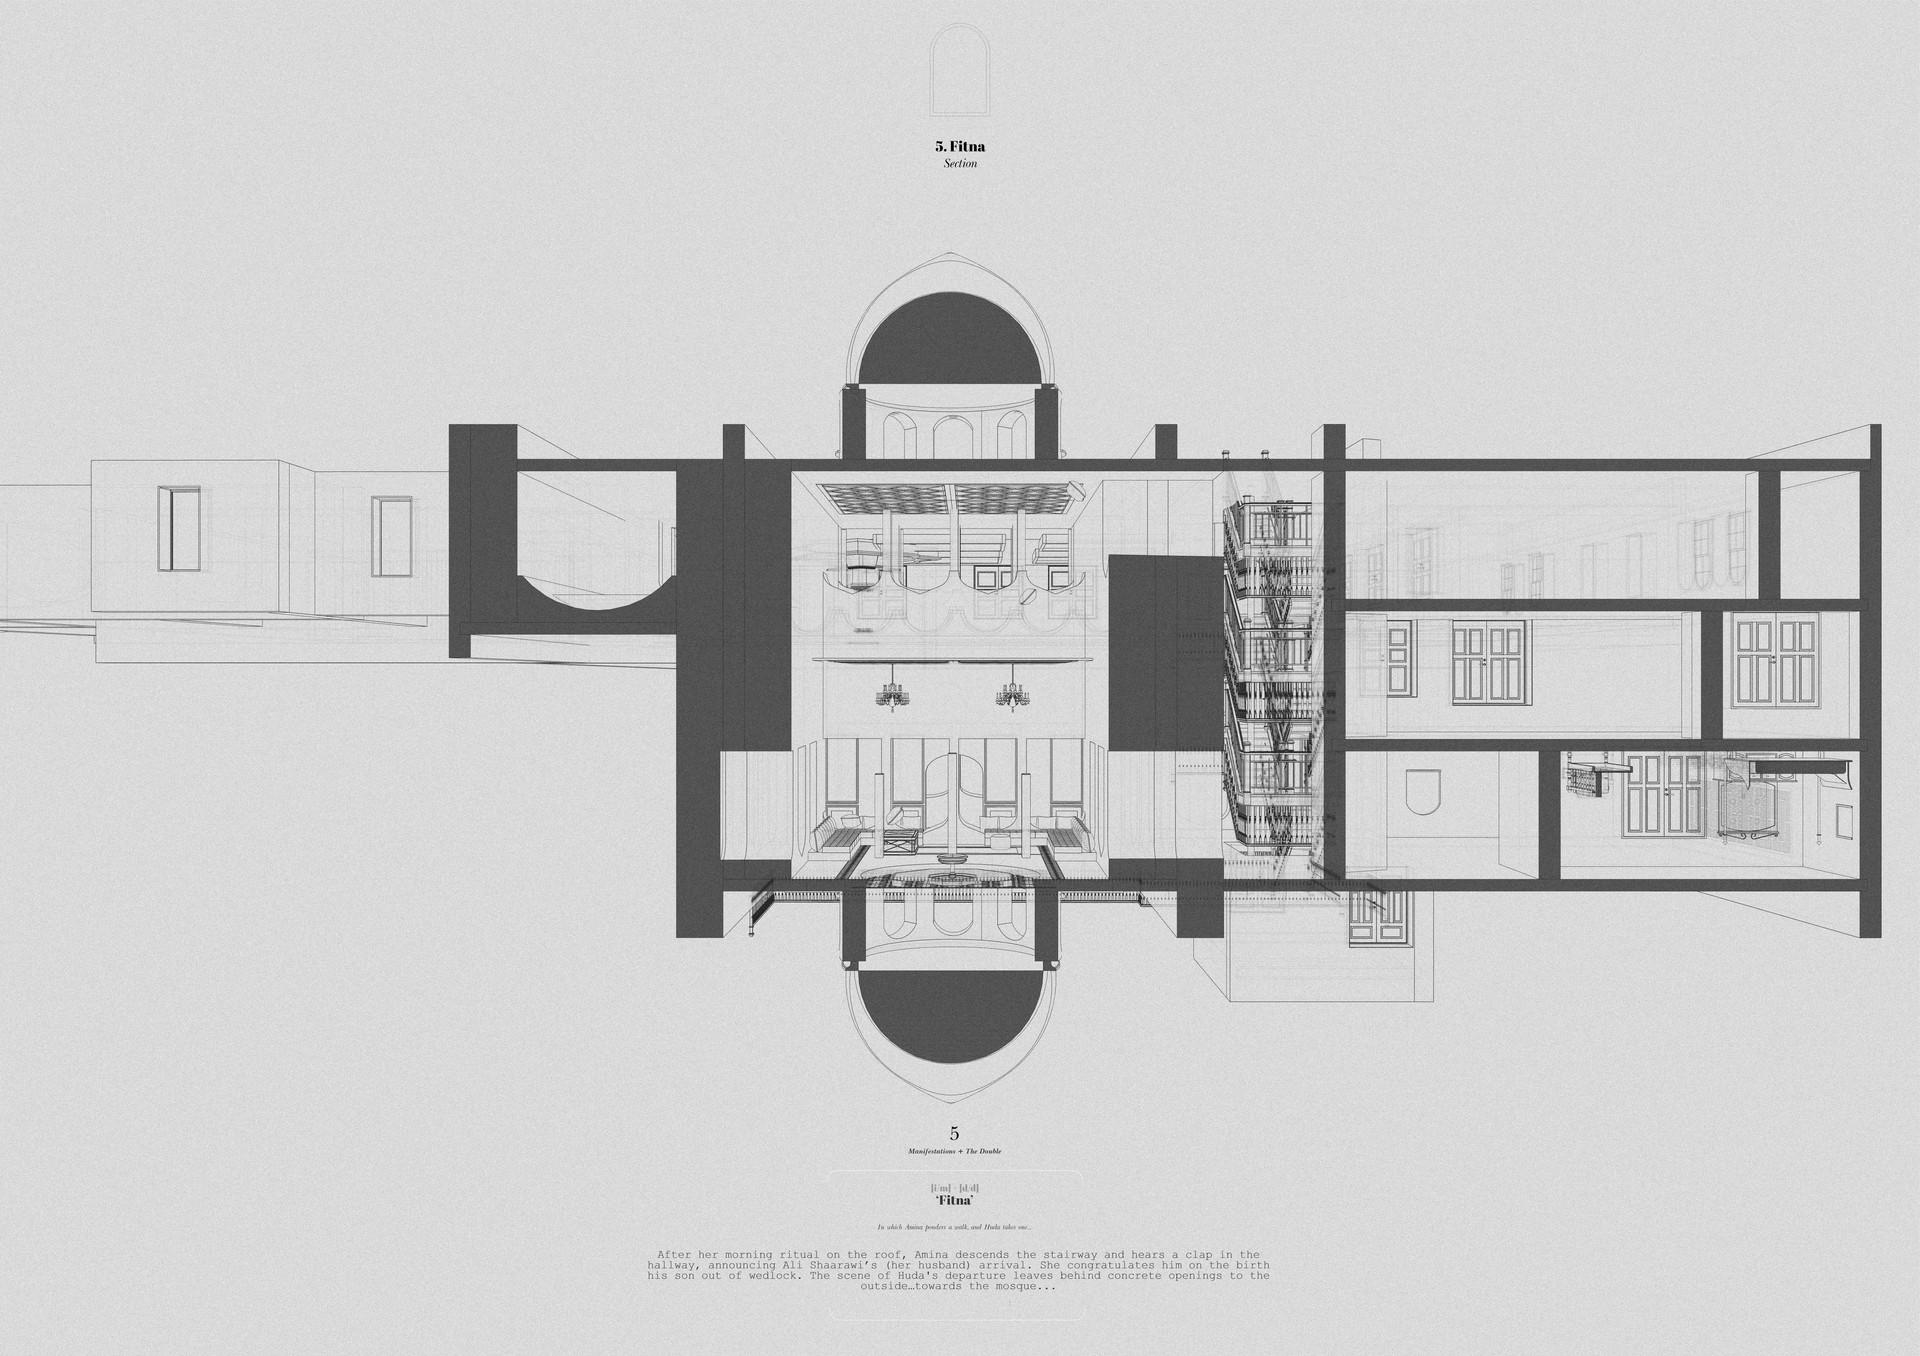 Fitna: Schematic